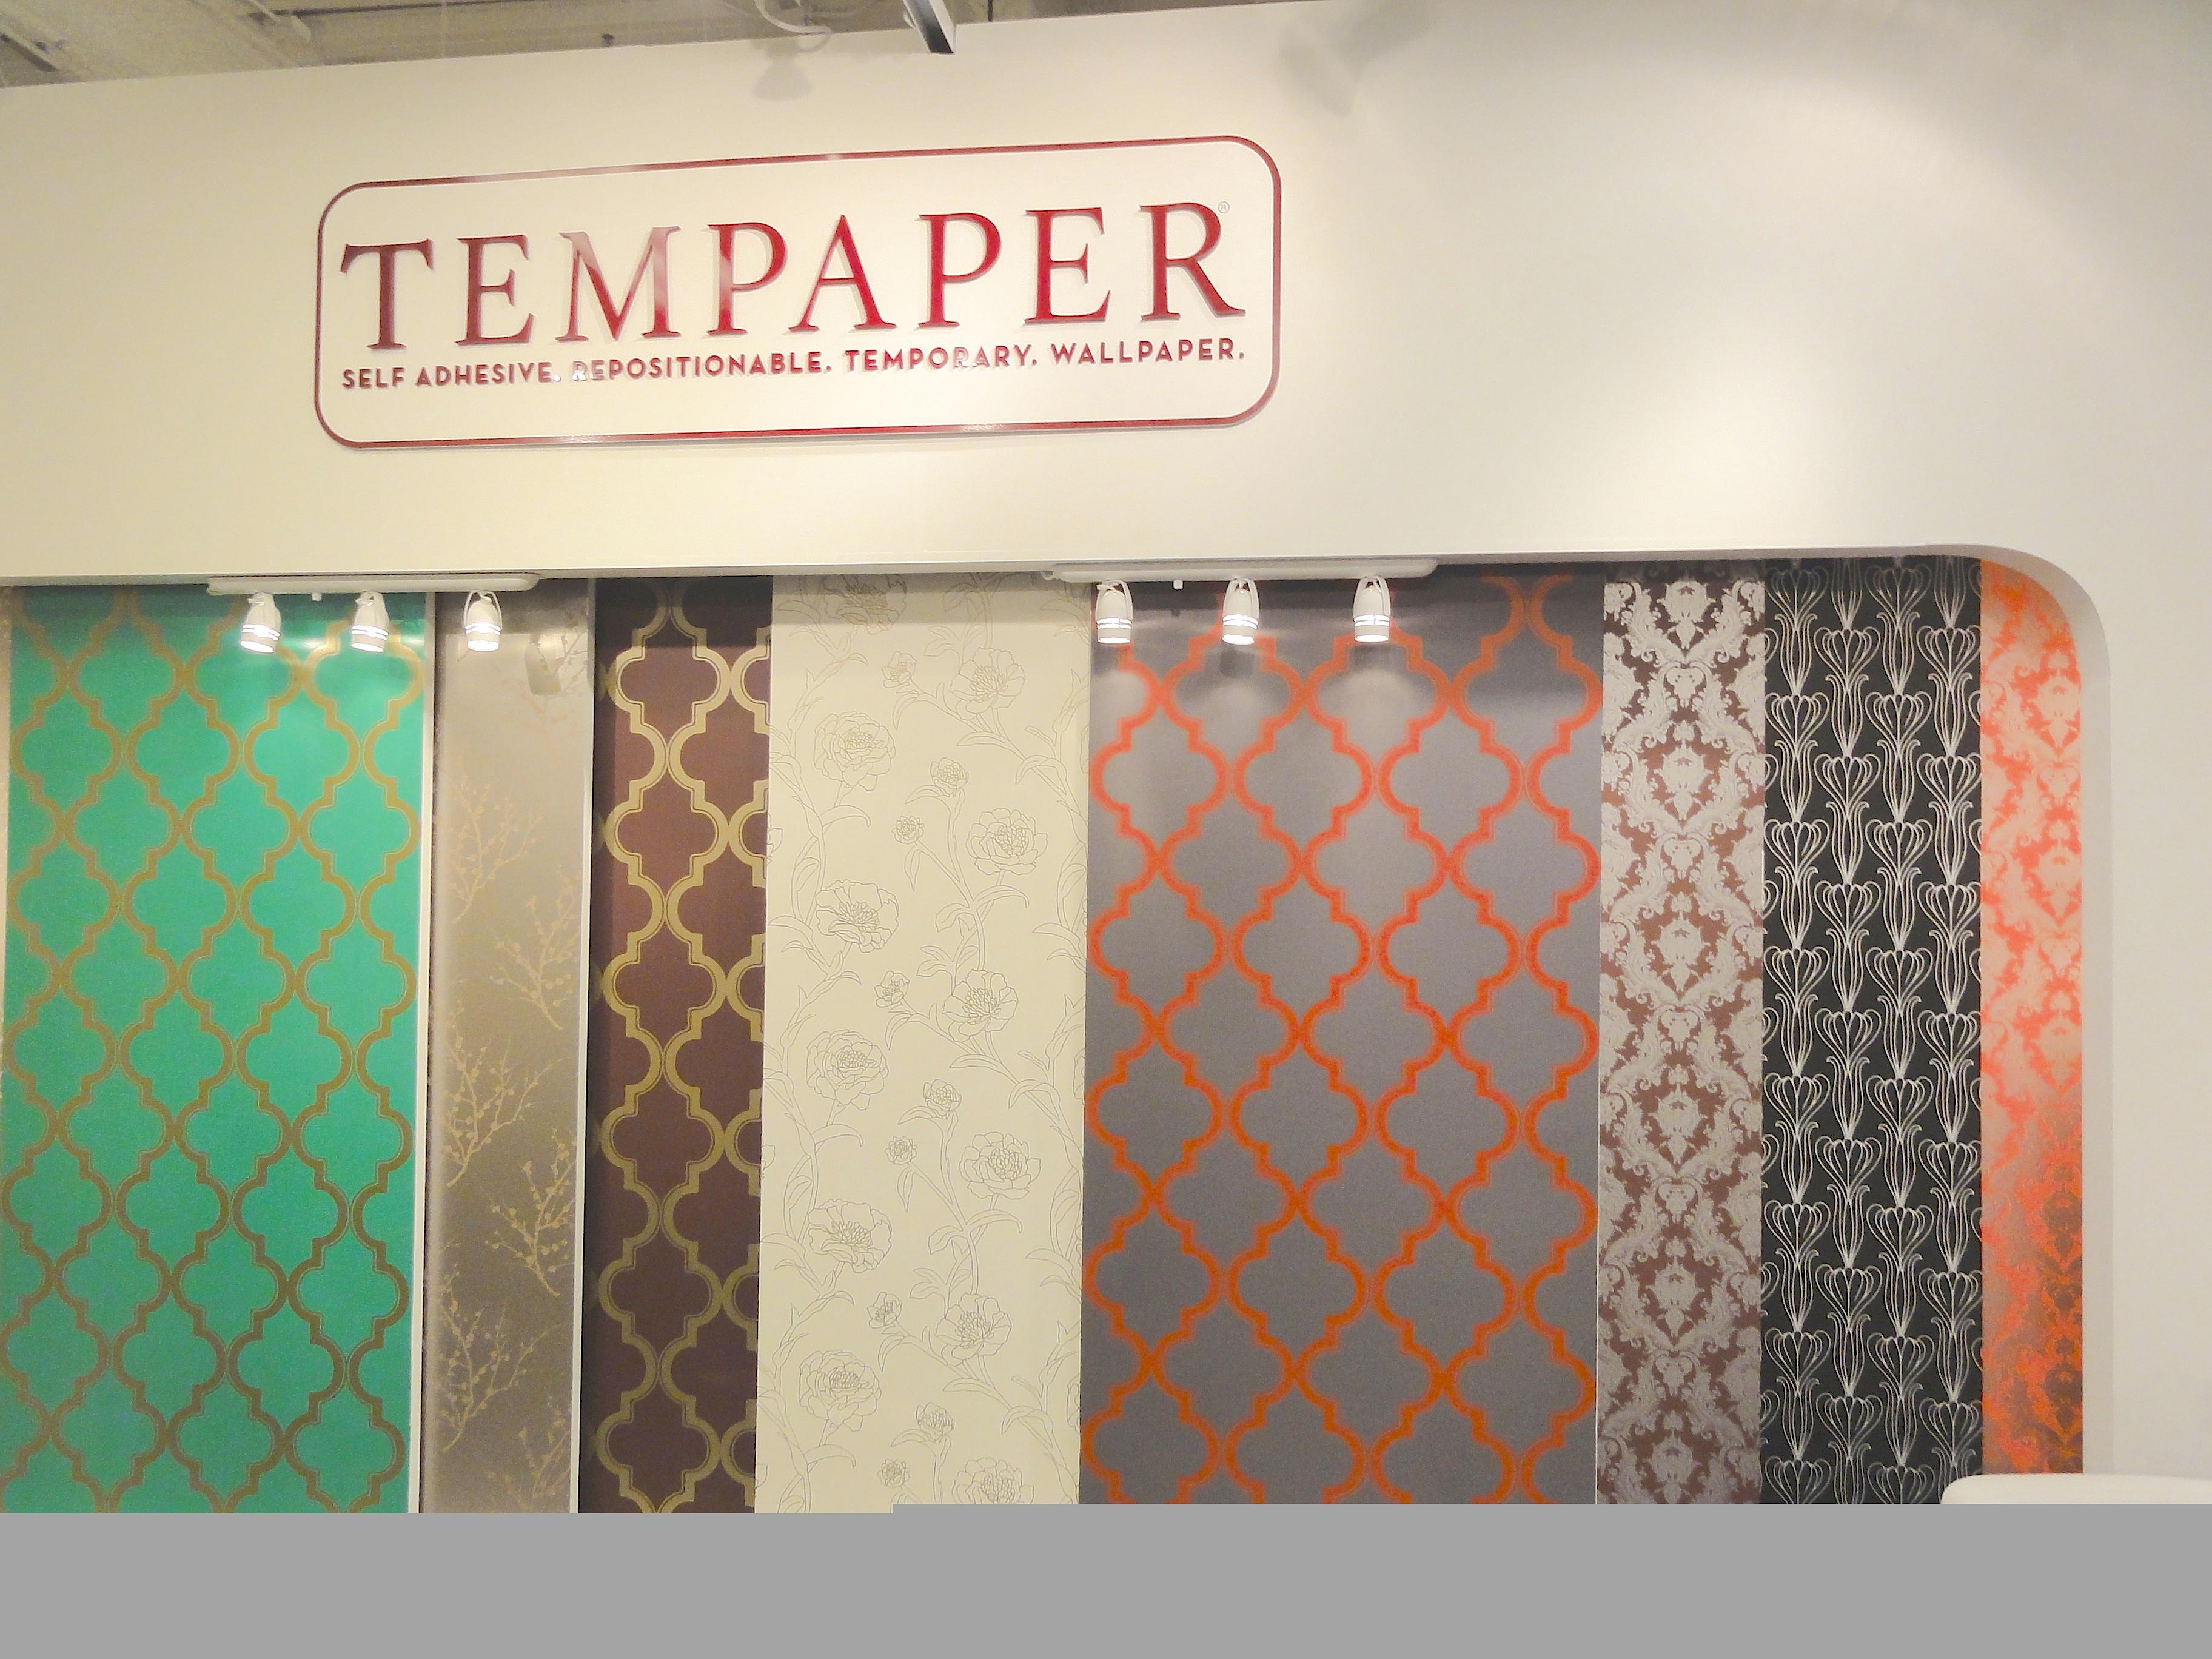 Temporary Wallpaper Clinic 3648x2736